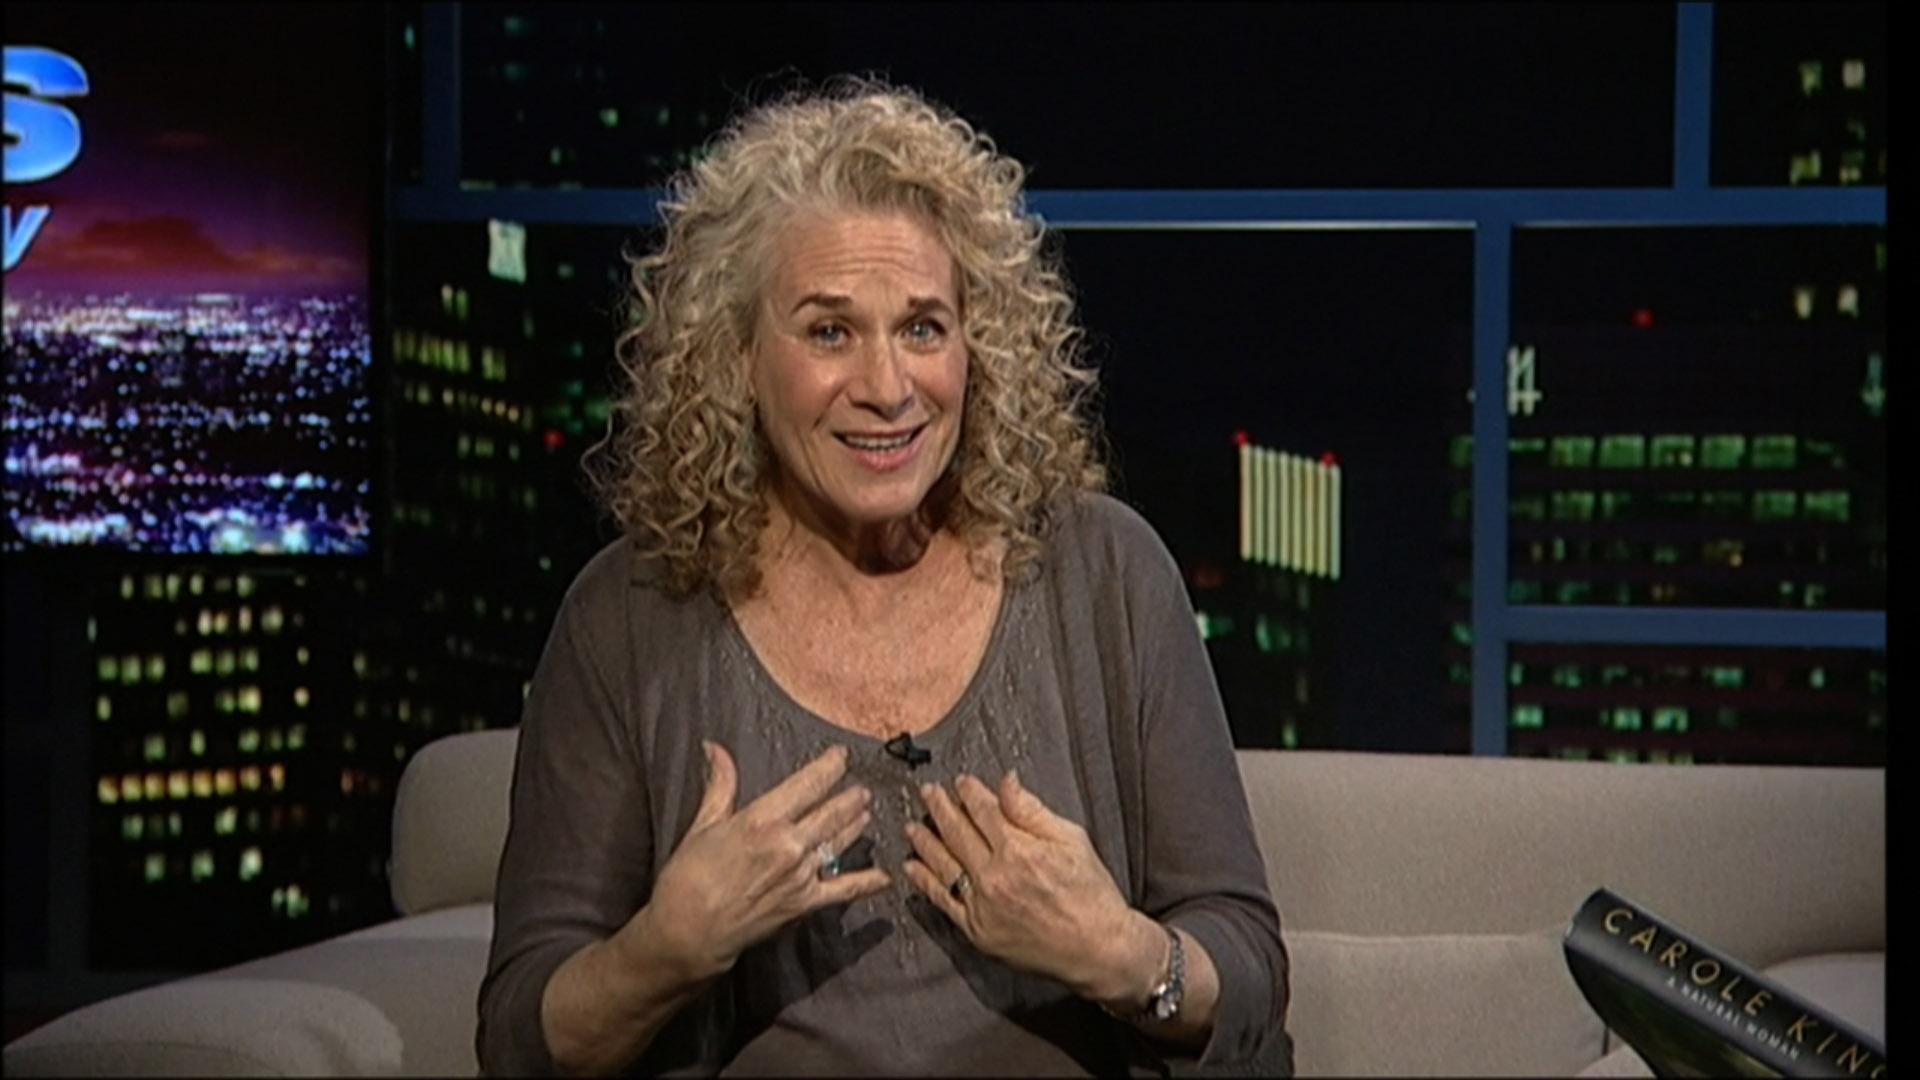 Singer-songwriter Carole King : December 21st, 2012 image